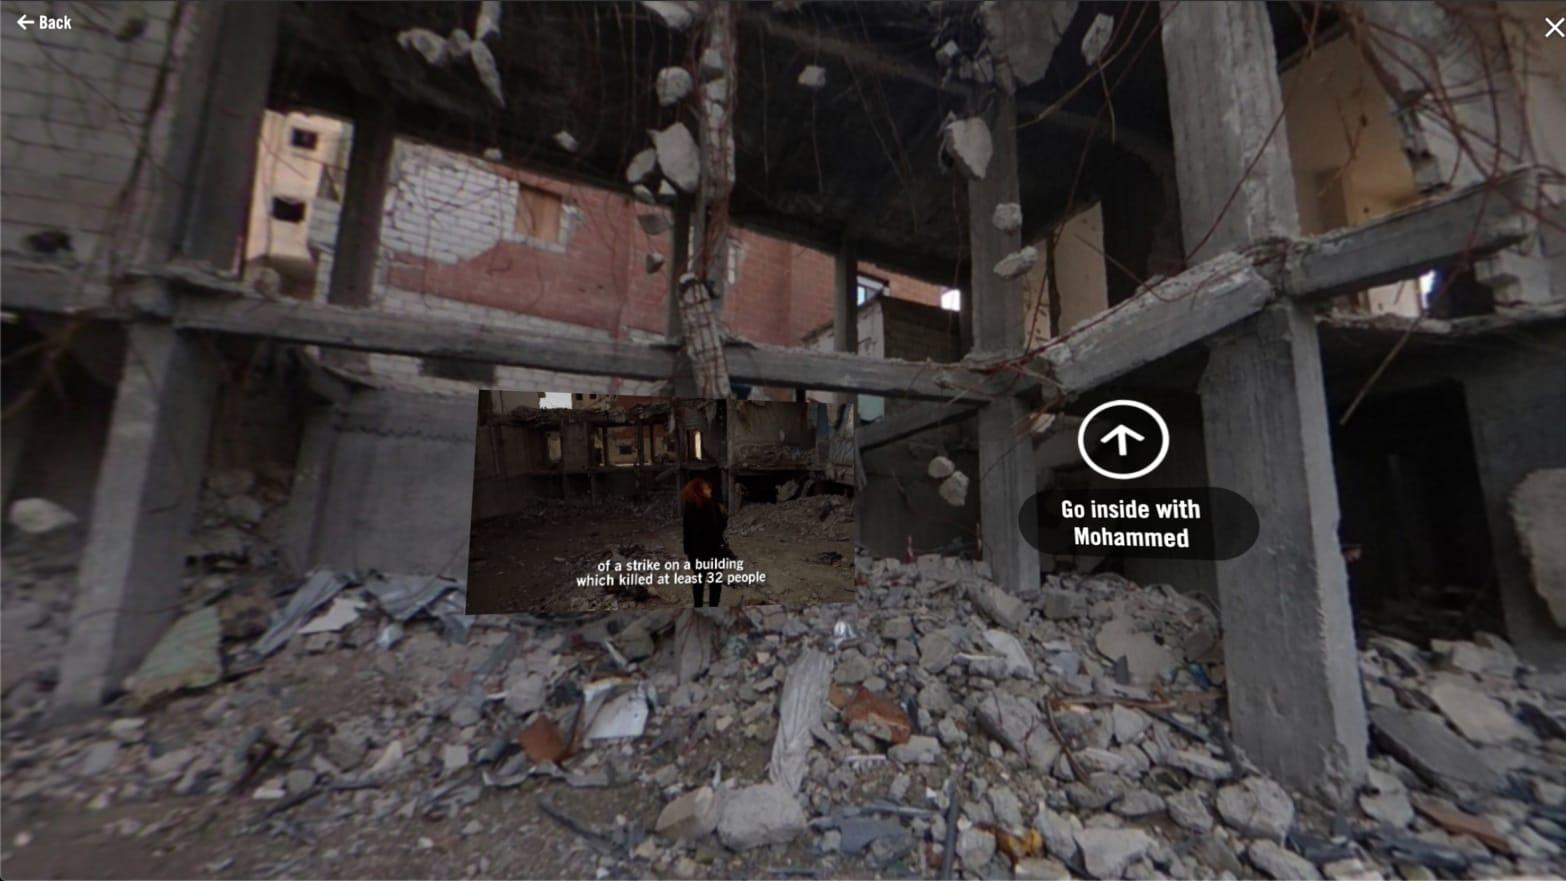 Raqqa: U.S.-Led Coalition Killed 1,600 Civilians in ISIS-Held Town, Amnesty International Says